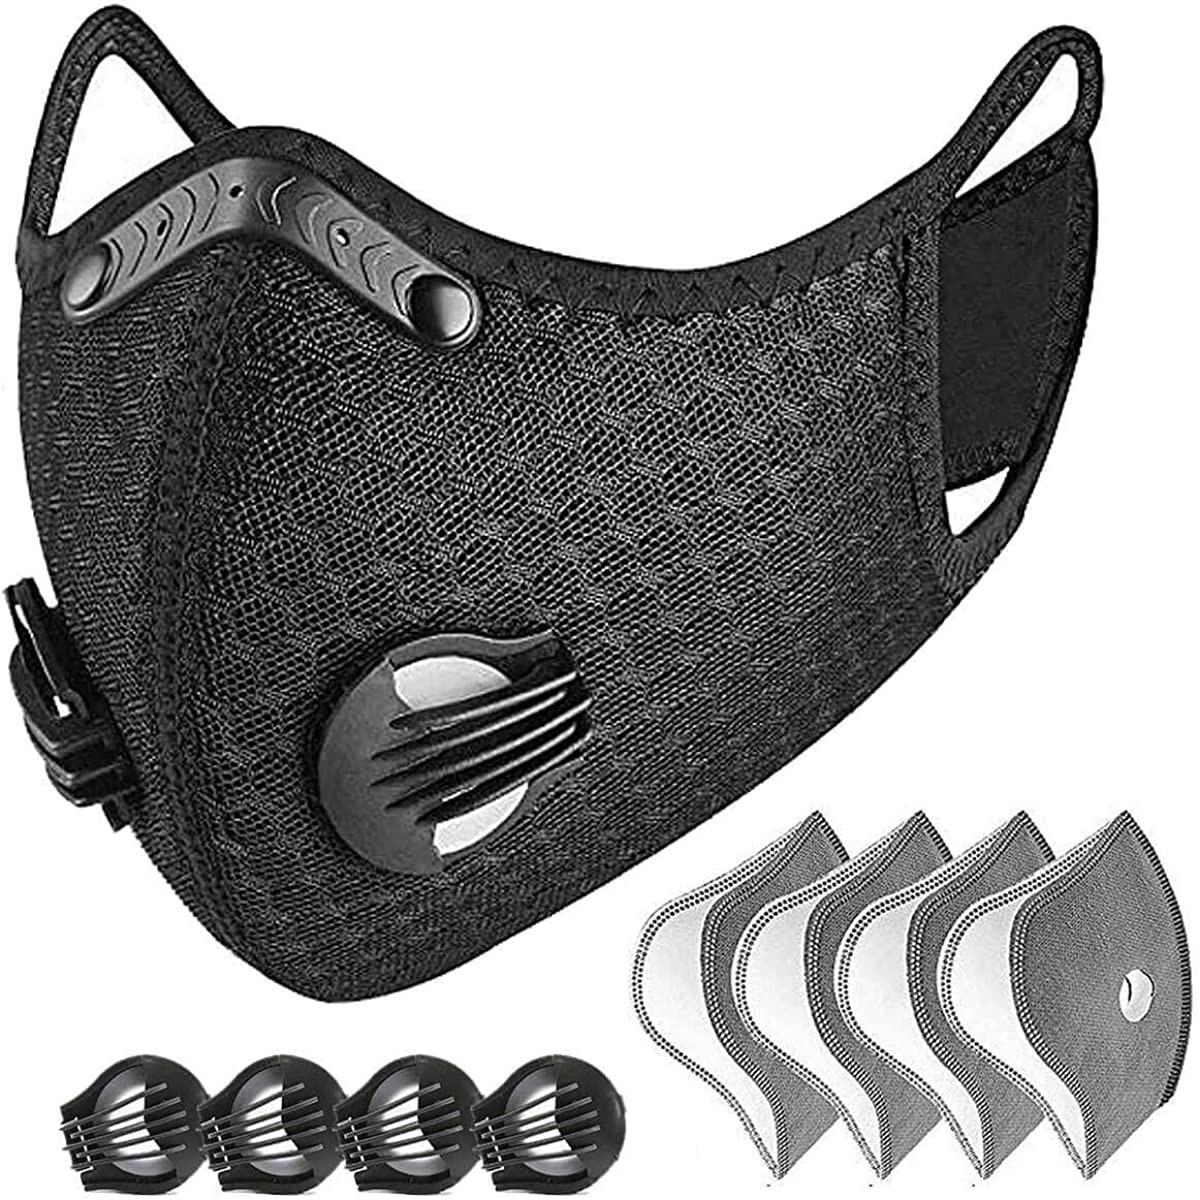 # H30 polvo con 4 filtros 4 válvulas de escape medio rostro respirador reutilizable a prueba de polvo máscara para ciclismo cara de ciclista máscara respirador